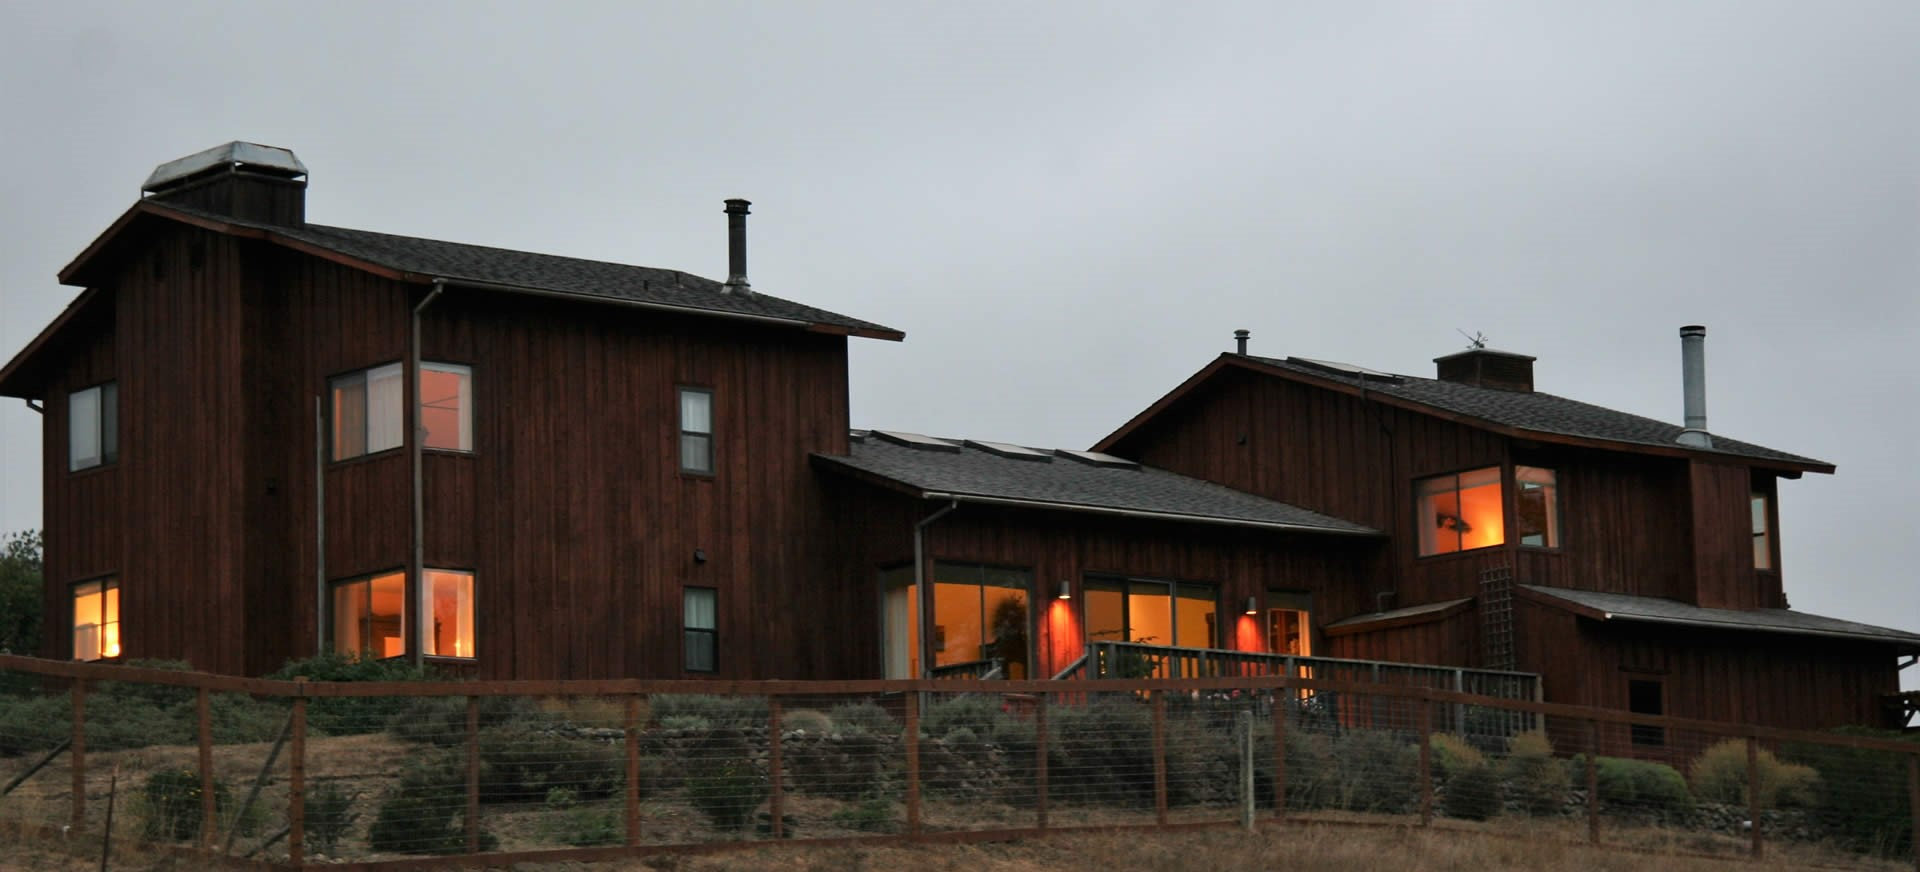 inn at roundstone farm evening time